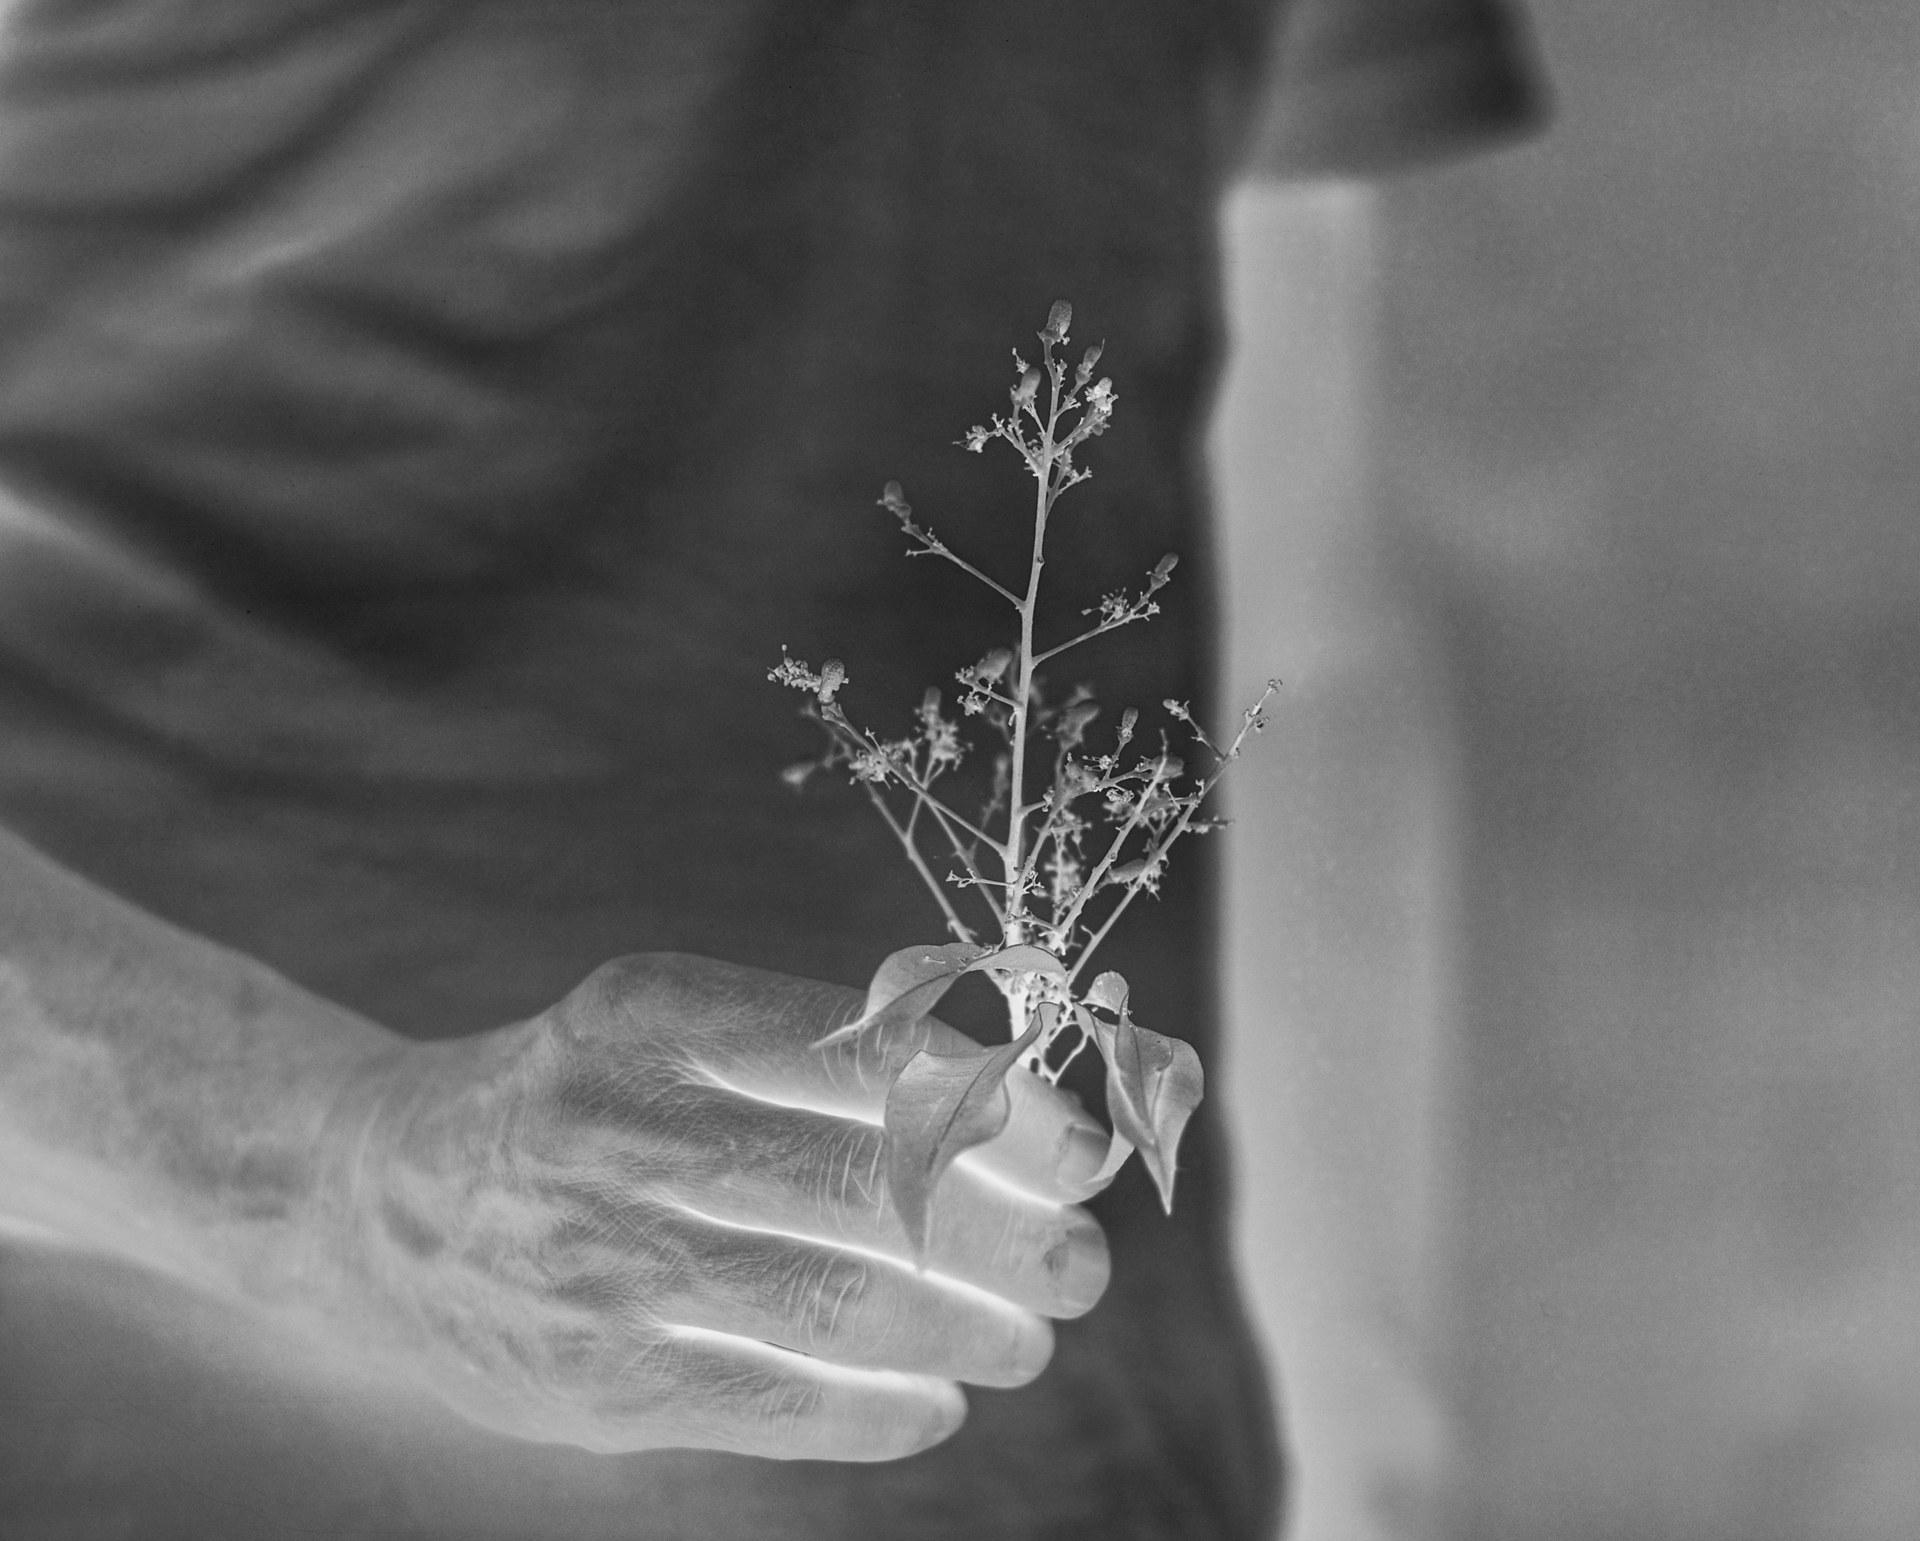 Lychee flower#1, 2021